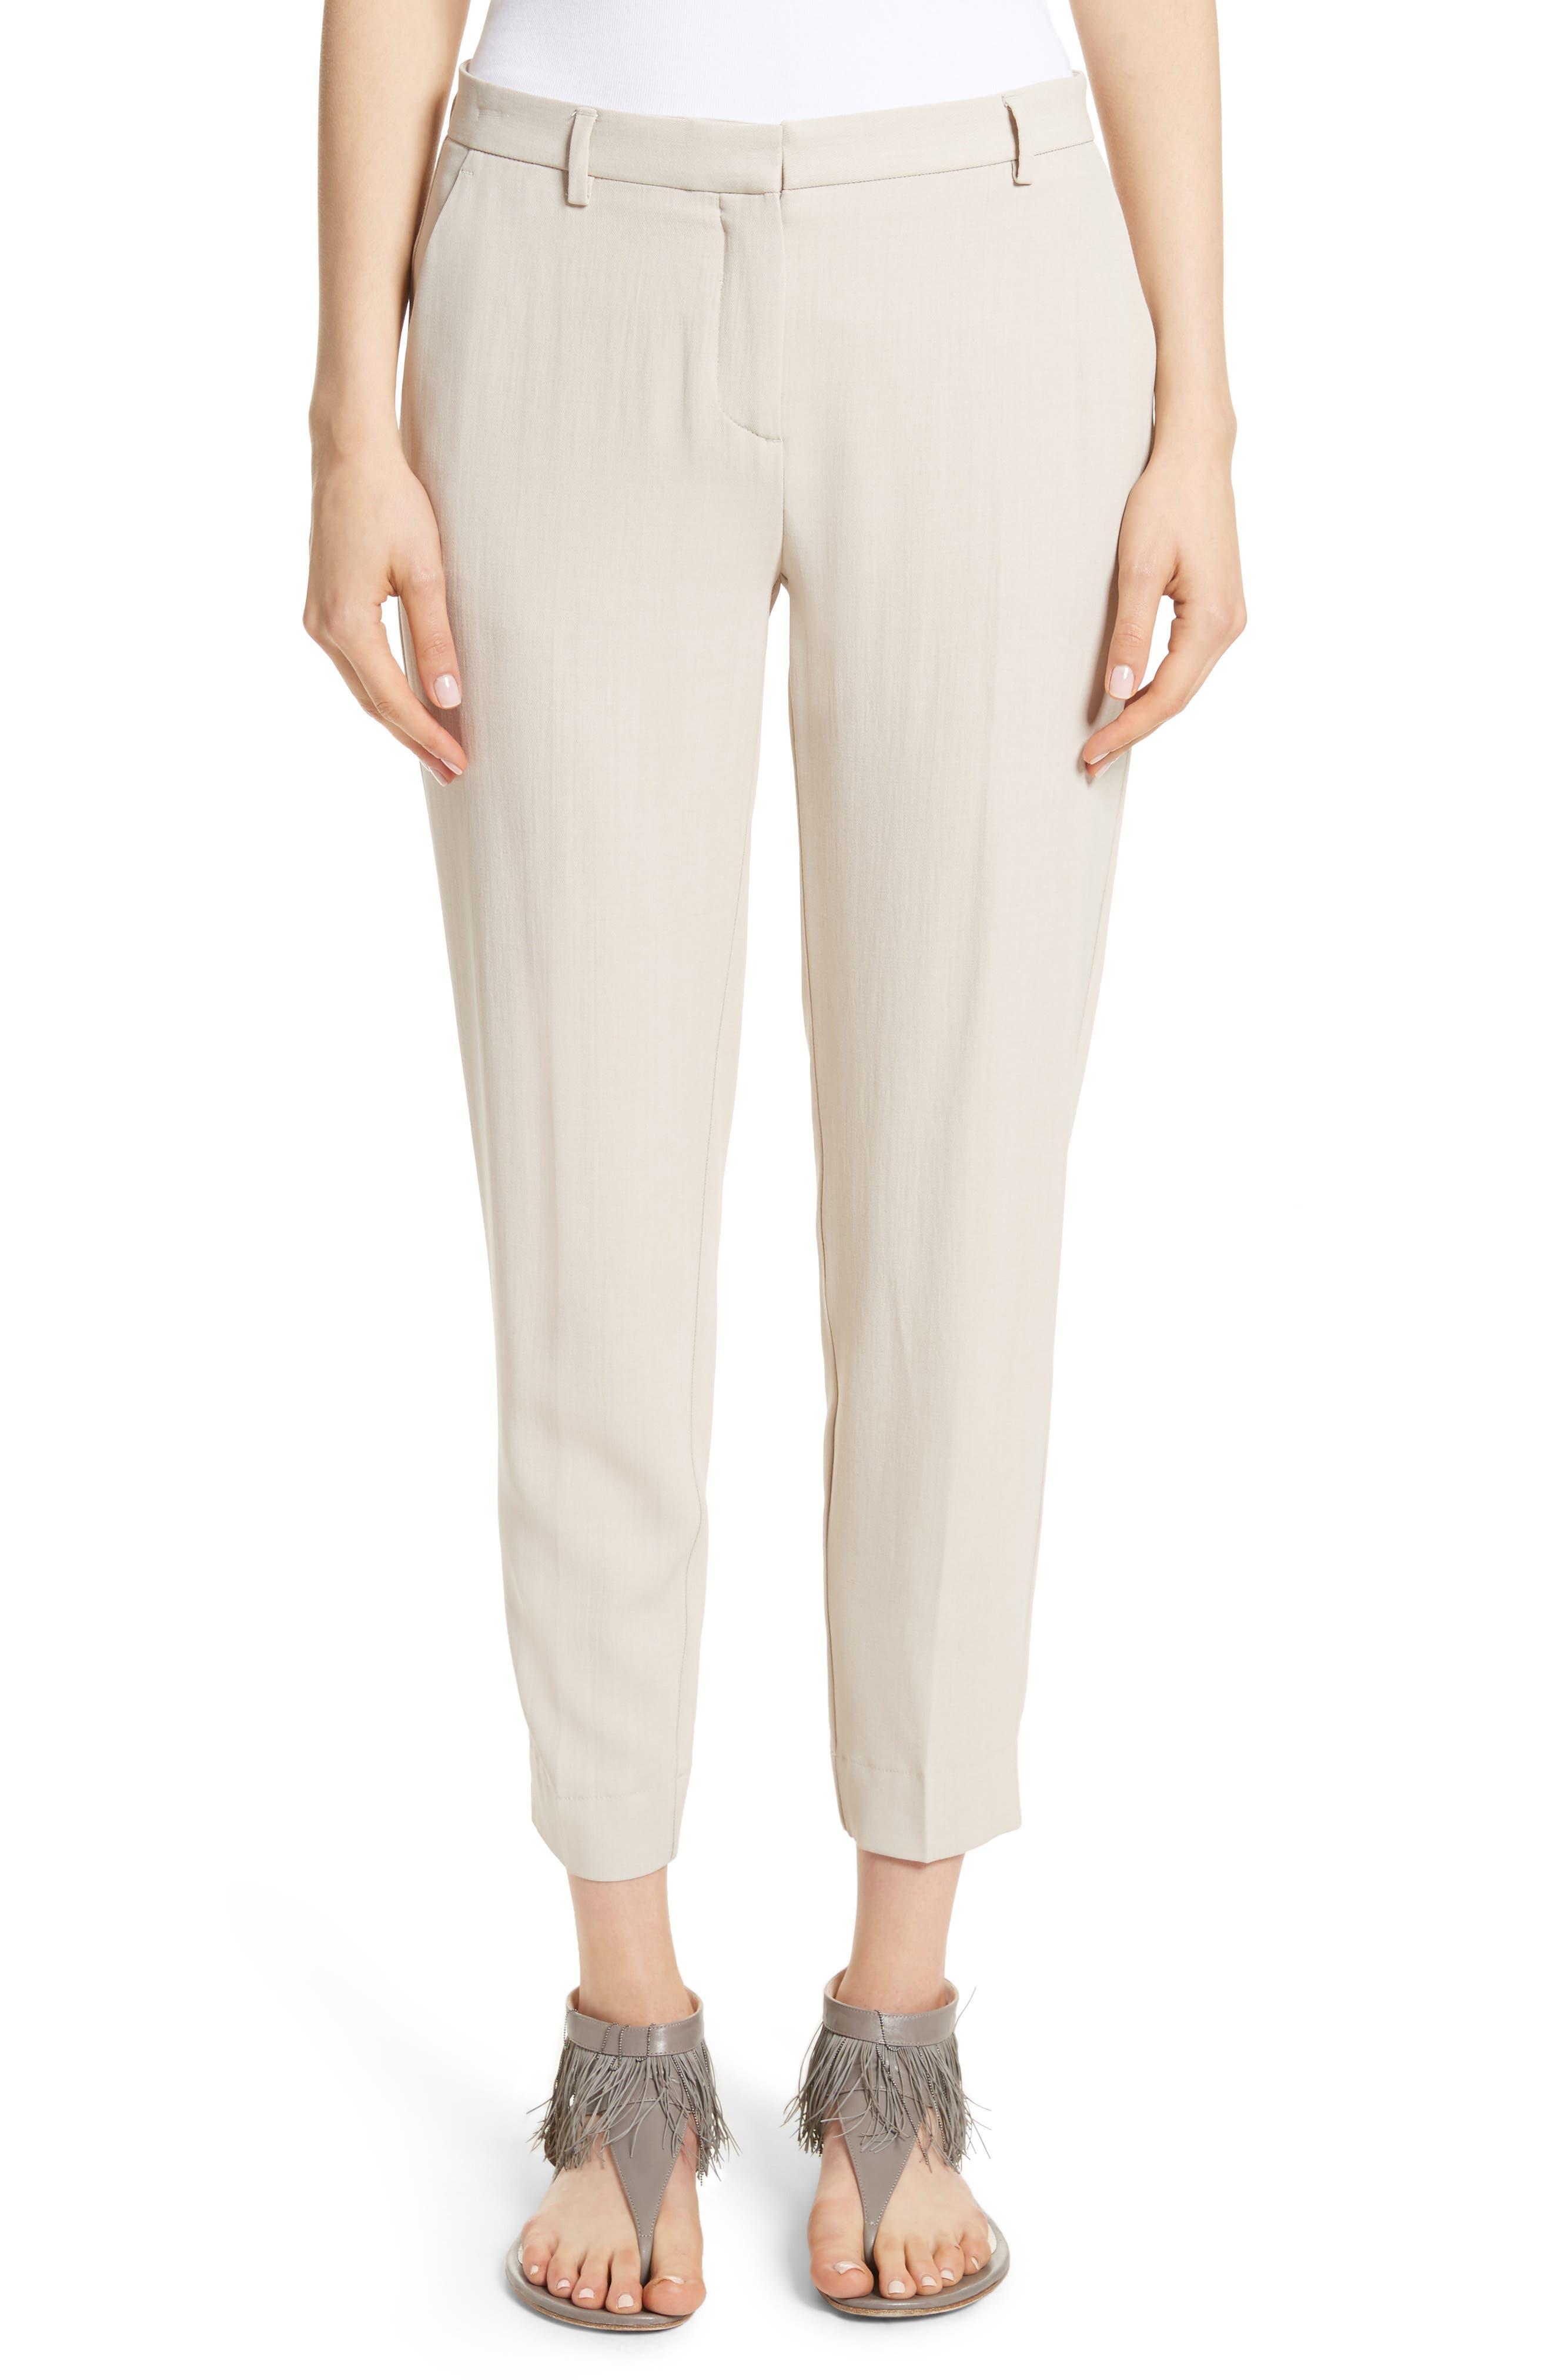 Alternate Image 1 Selected - Fabiana Filippi Wool Blend Ankle Pants